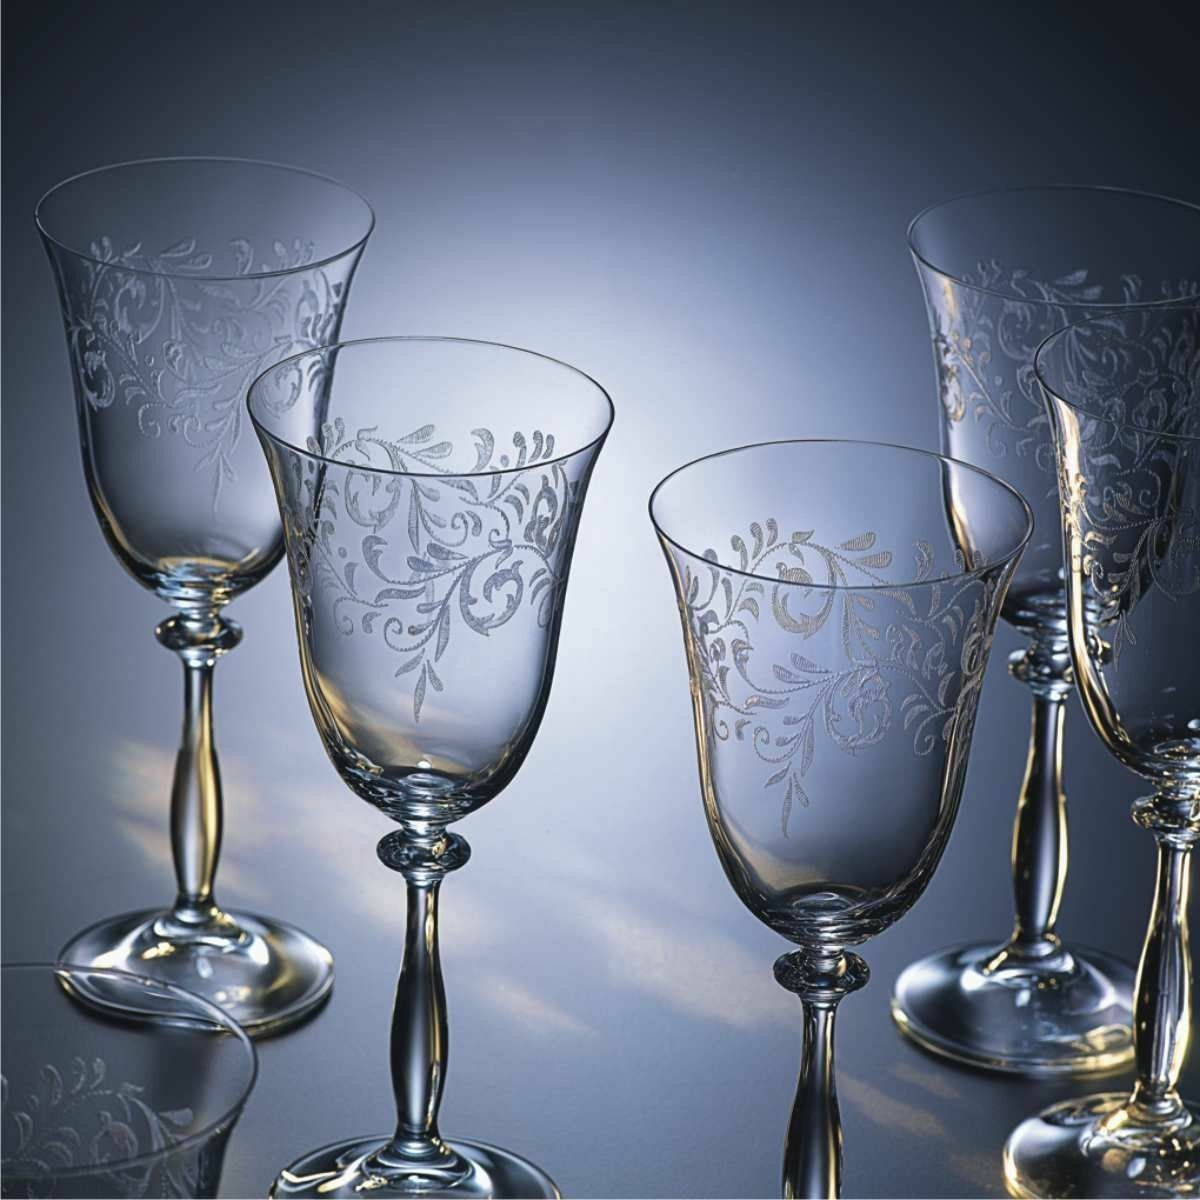 Copa cava, vasos set de vino, Model Royal-Ángela, cristal Bohemia, 6er set vasos ac2a91